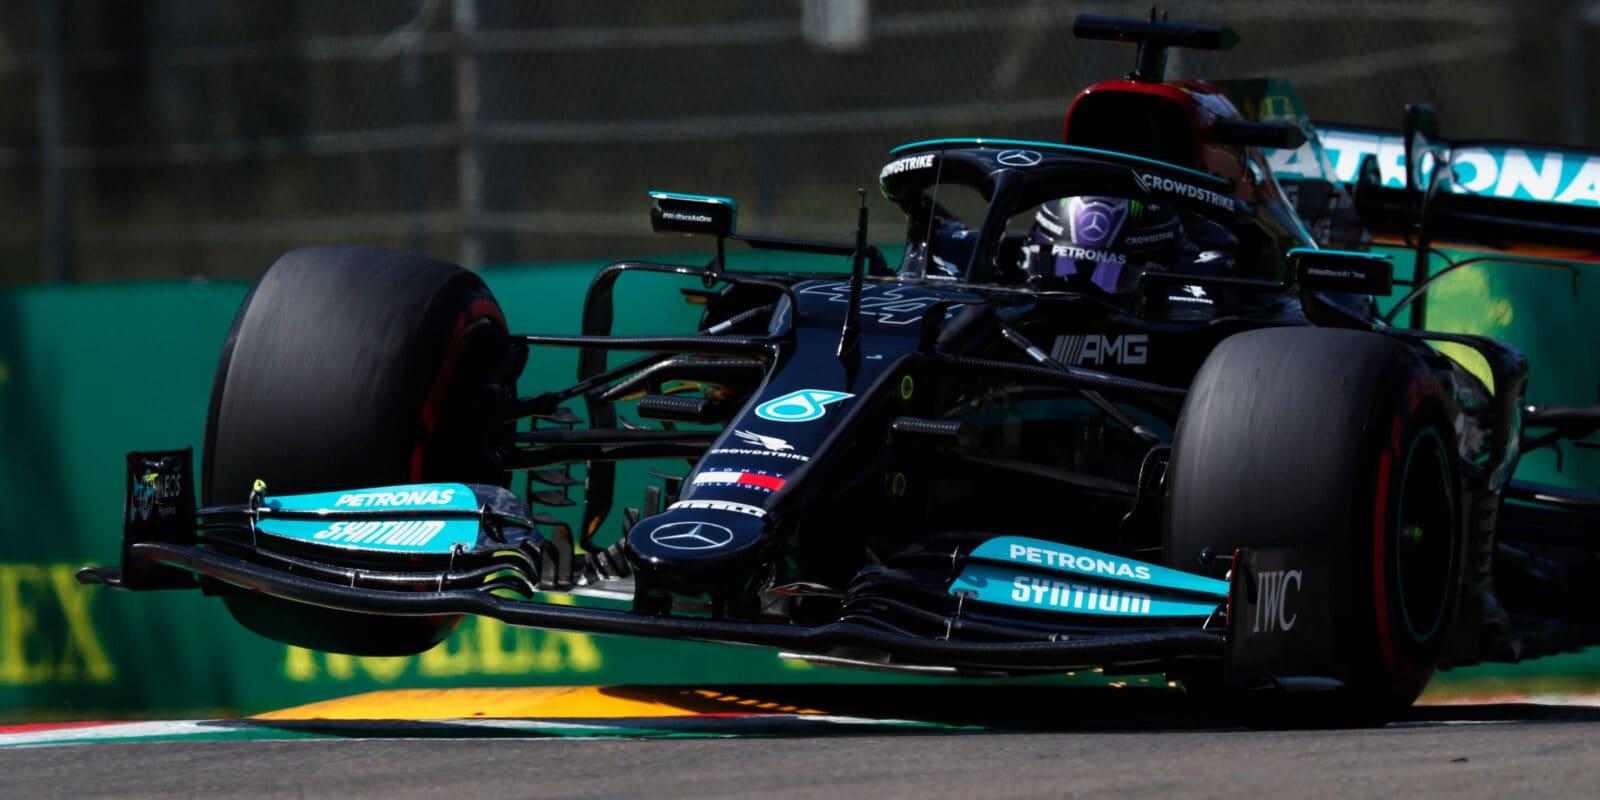 Kvalifikaci na VC Emilia-Romagna ovládl Lewis Hamilton